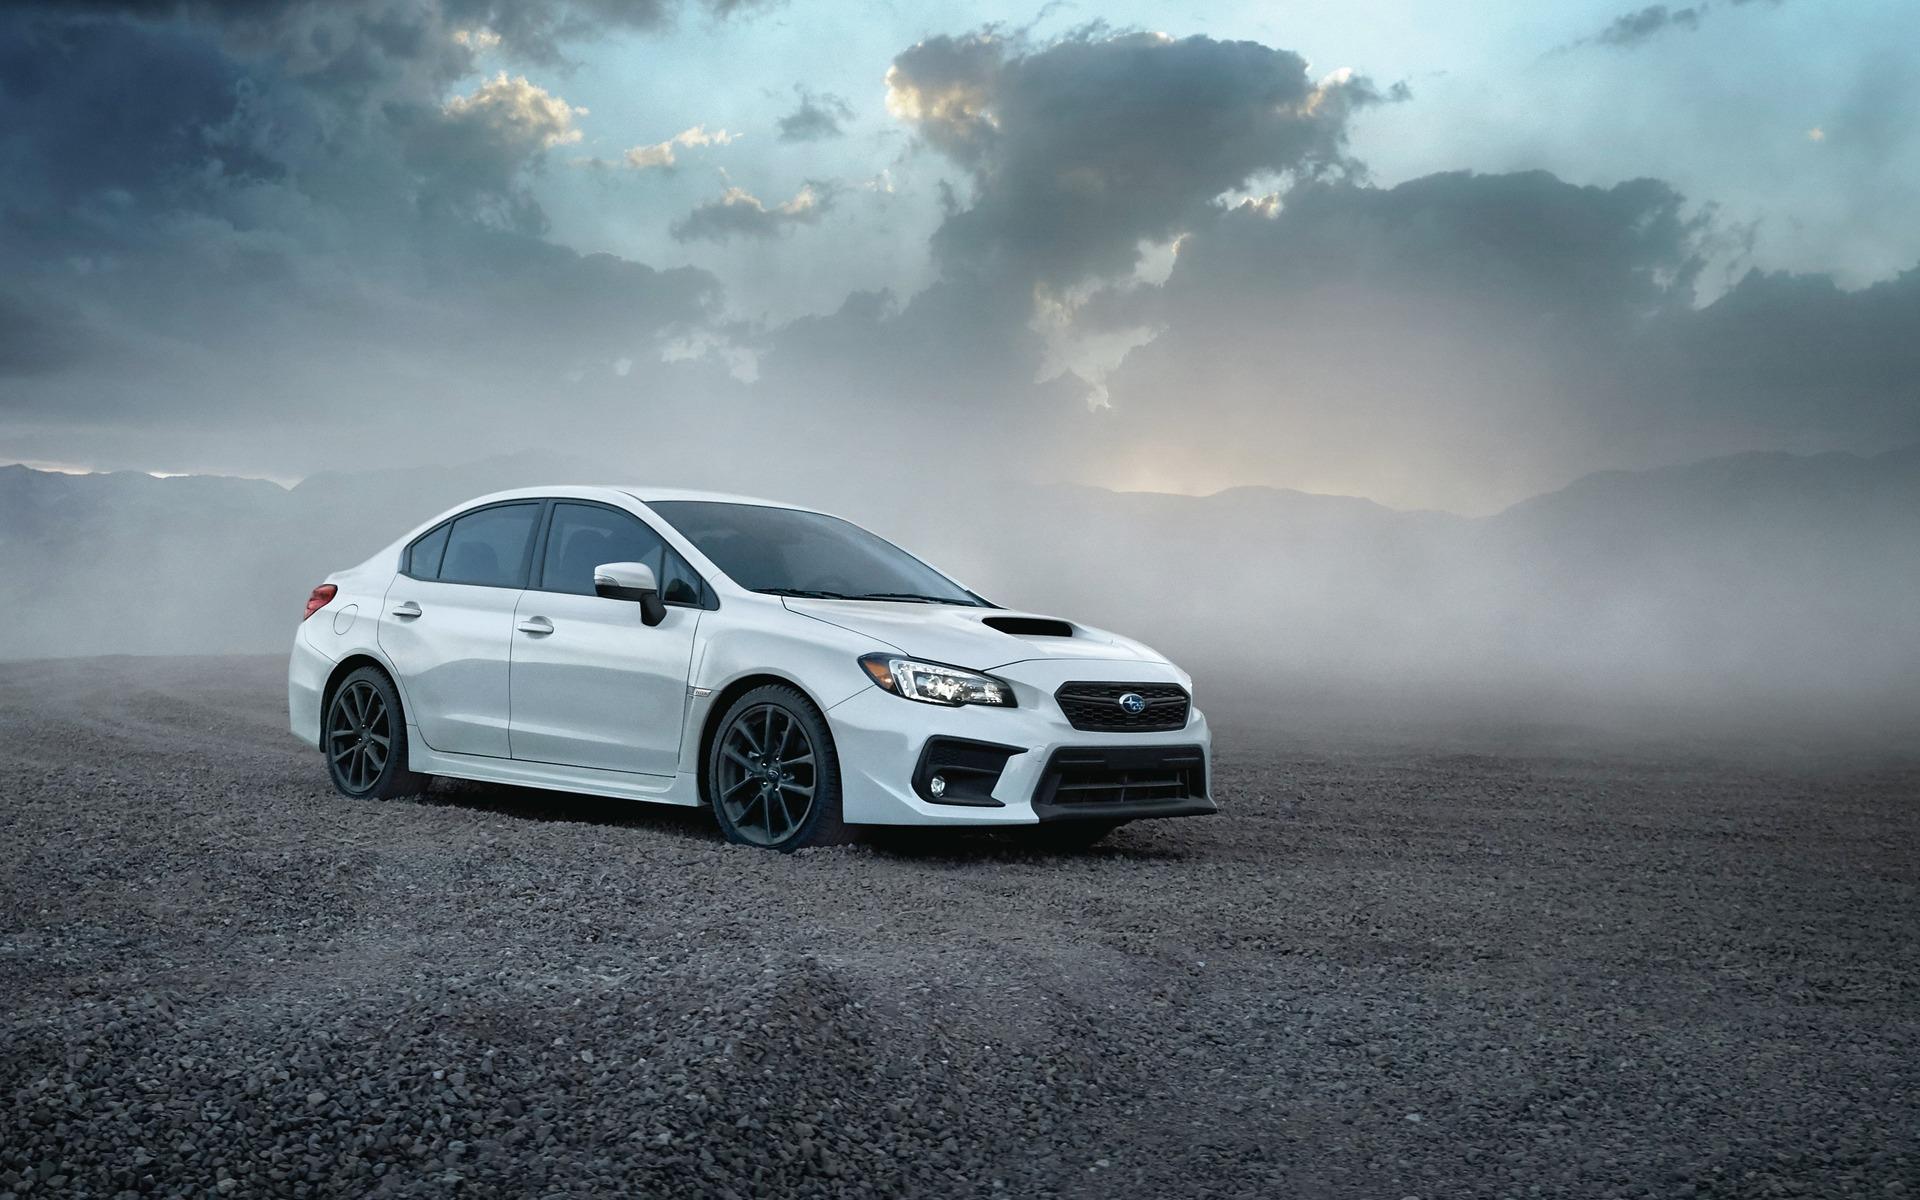 2020 Subaru WRX and WRX STI Get Minor Updates - The Car Guide